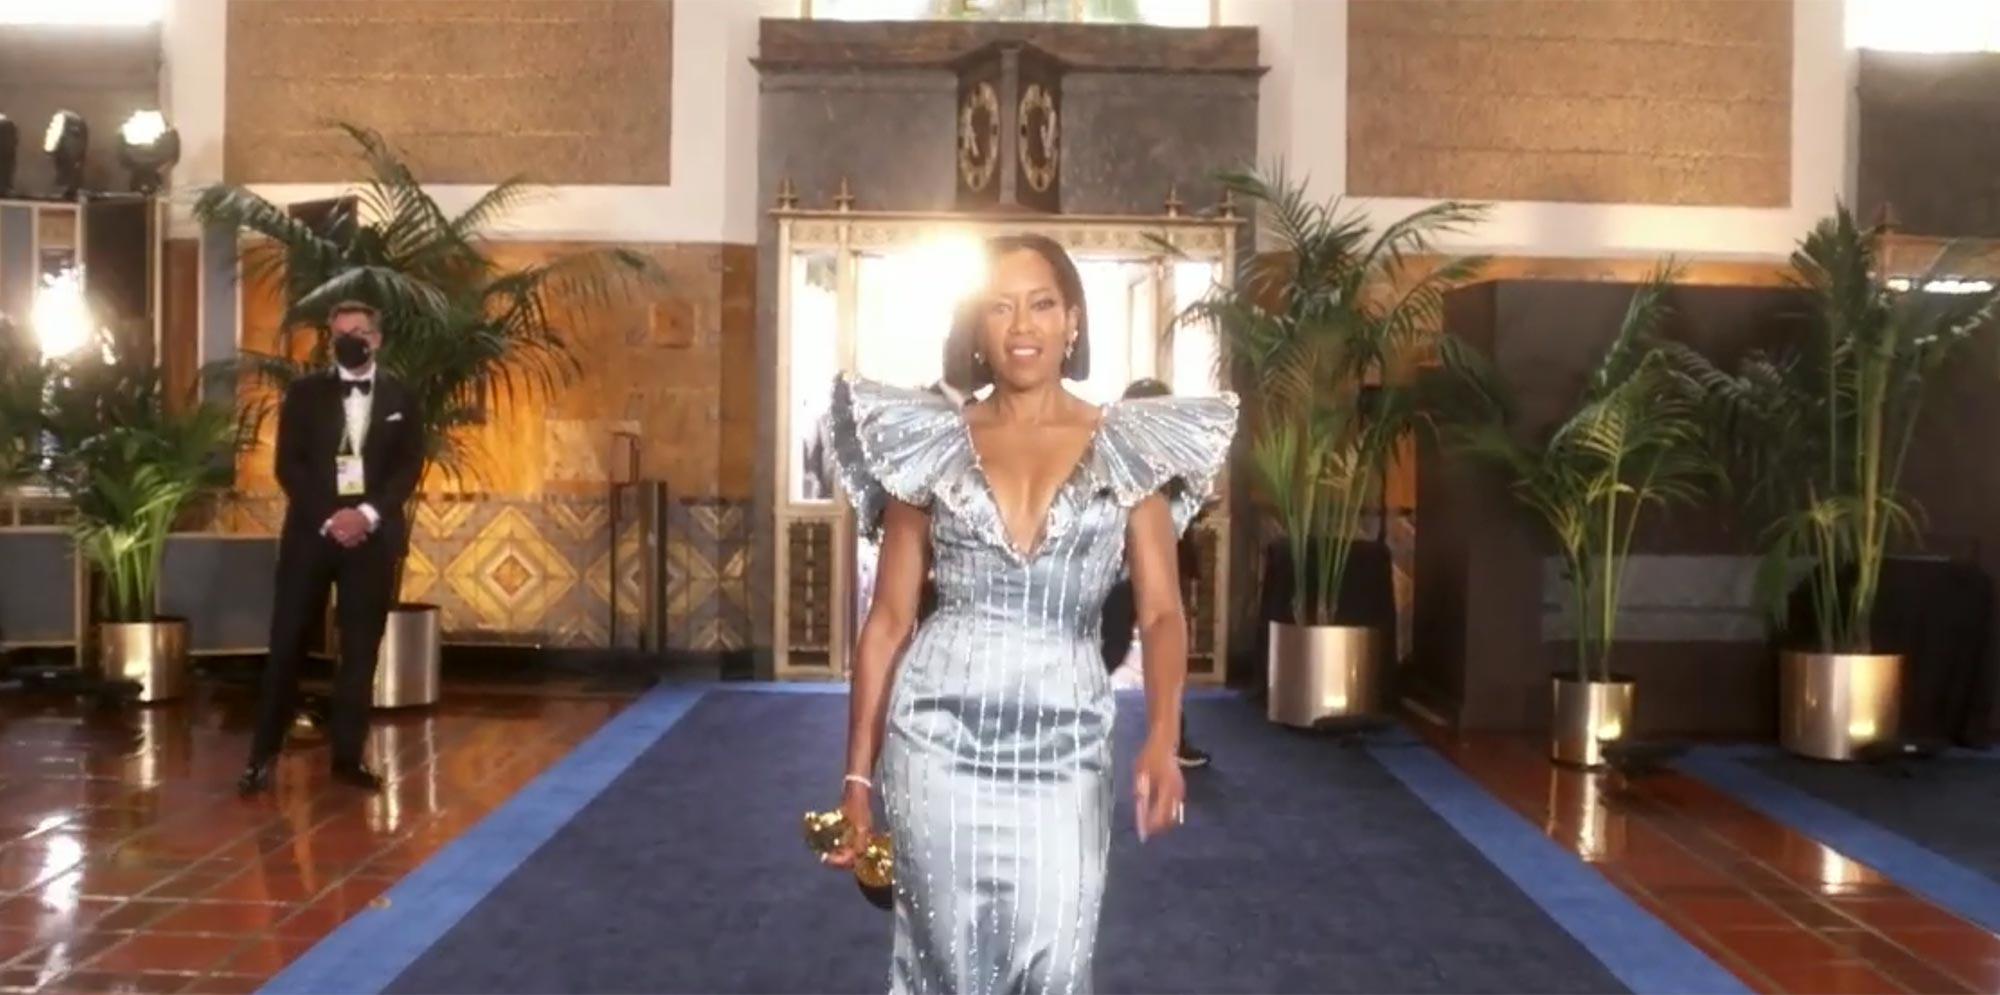 93rd Annual Academy Awards Regina King entrance